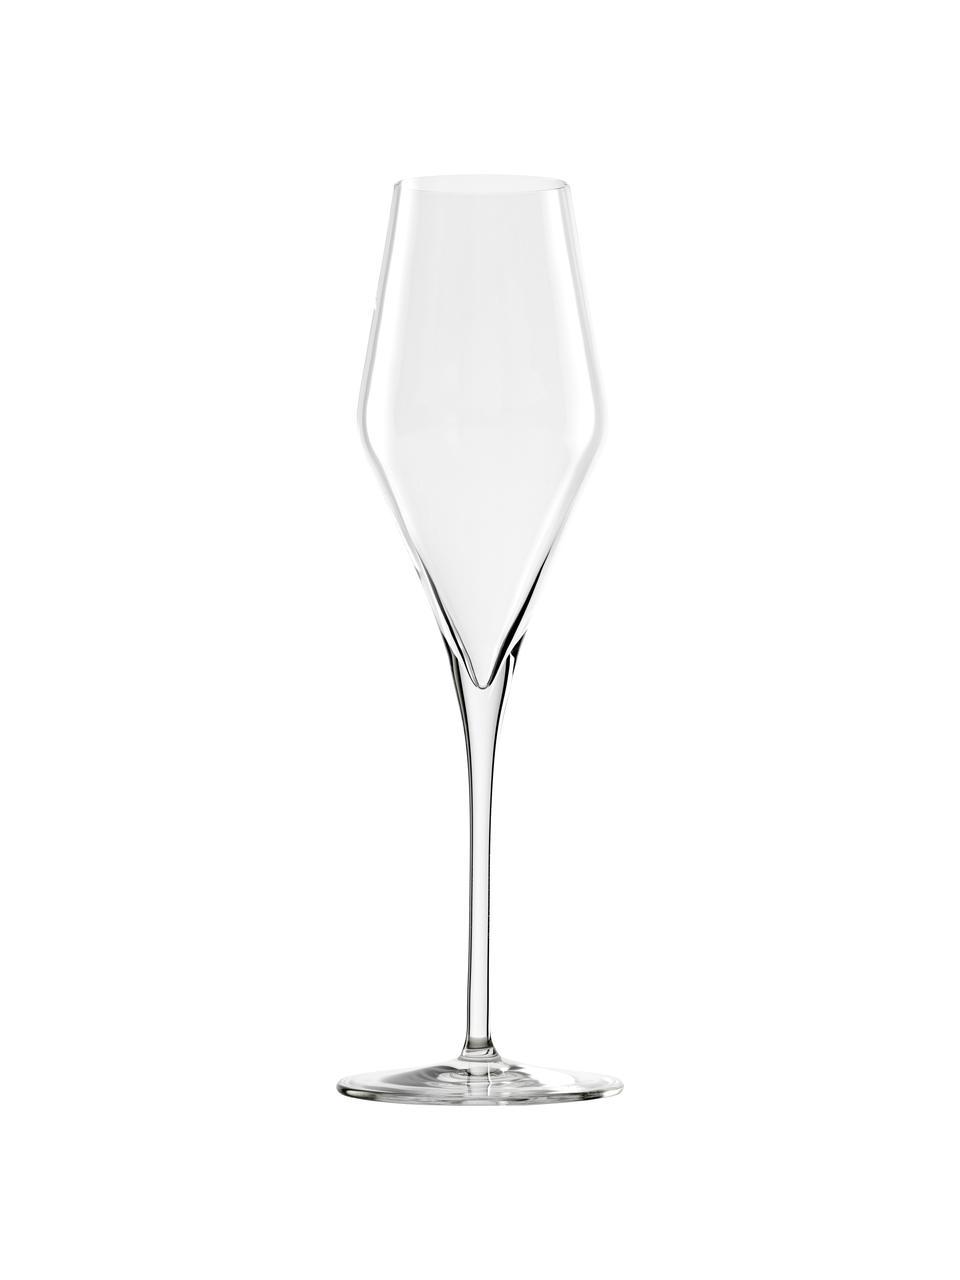 Champagneglazen Quatrophil, 6 stuks, Kristalglas, Transparant, Ø 8 x H 26 cm